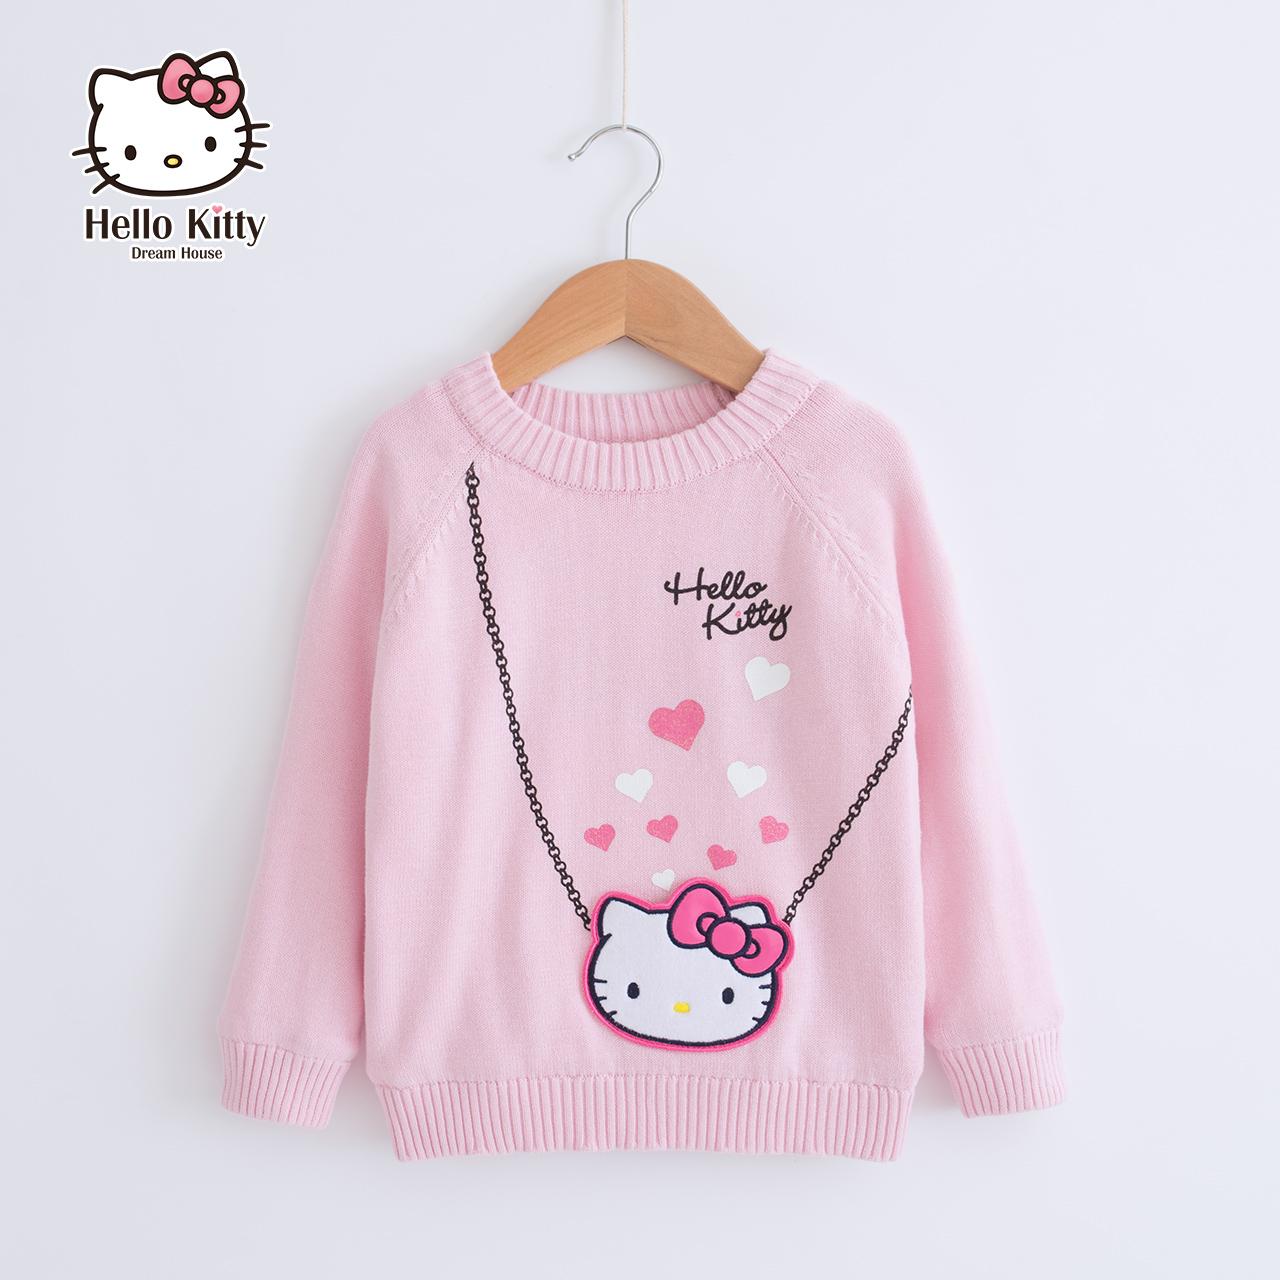 Hello kitty童装儿童2018秋冬新款韩版宝宝毛衣中大童套头针织衫